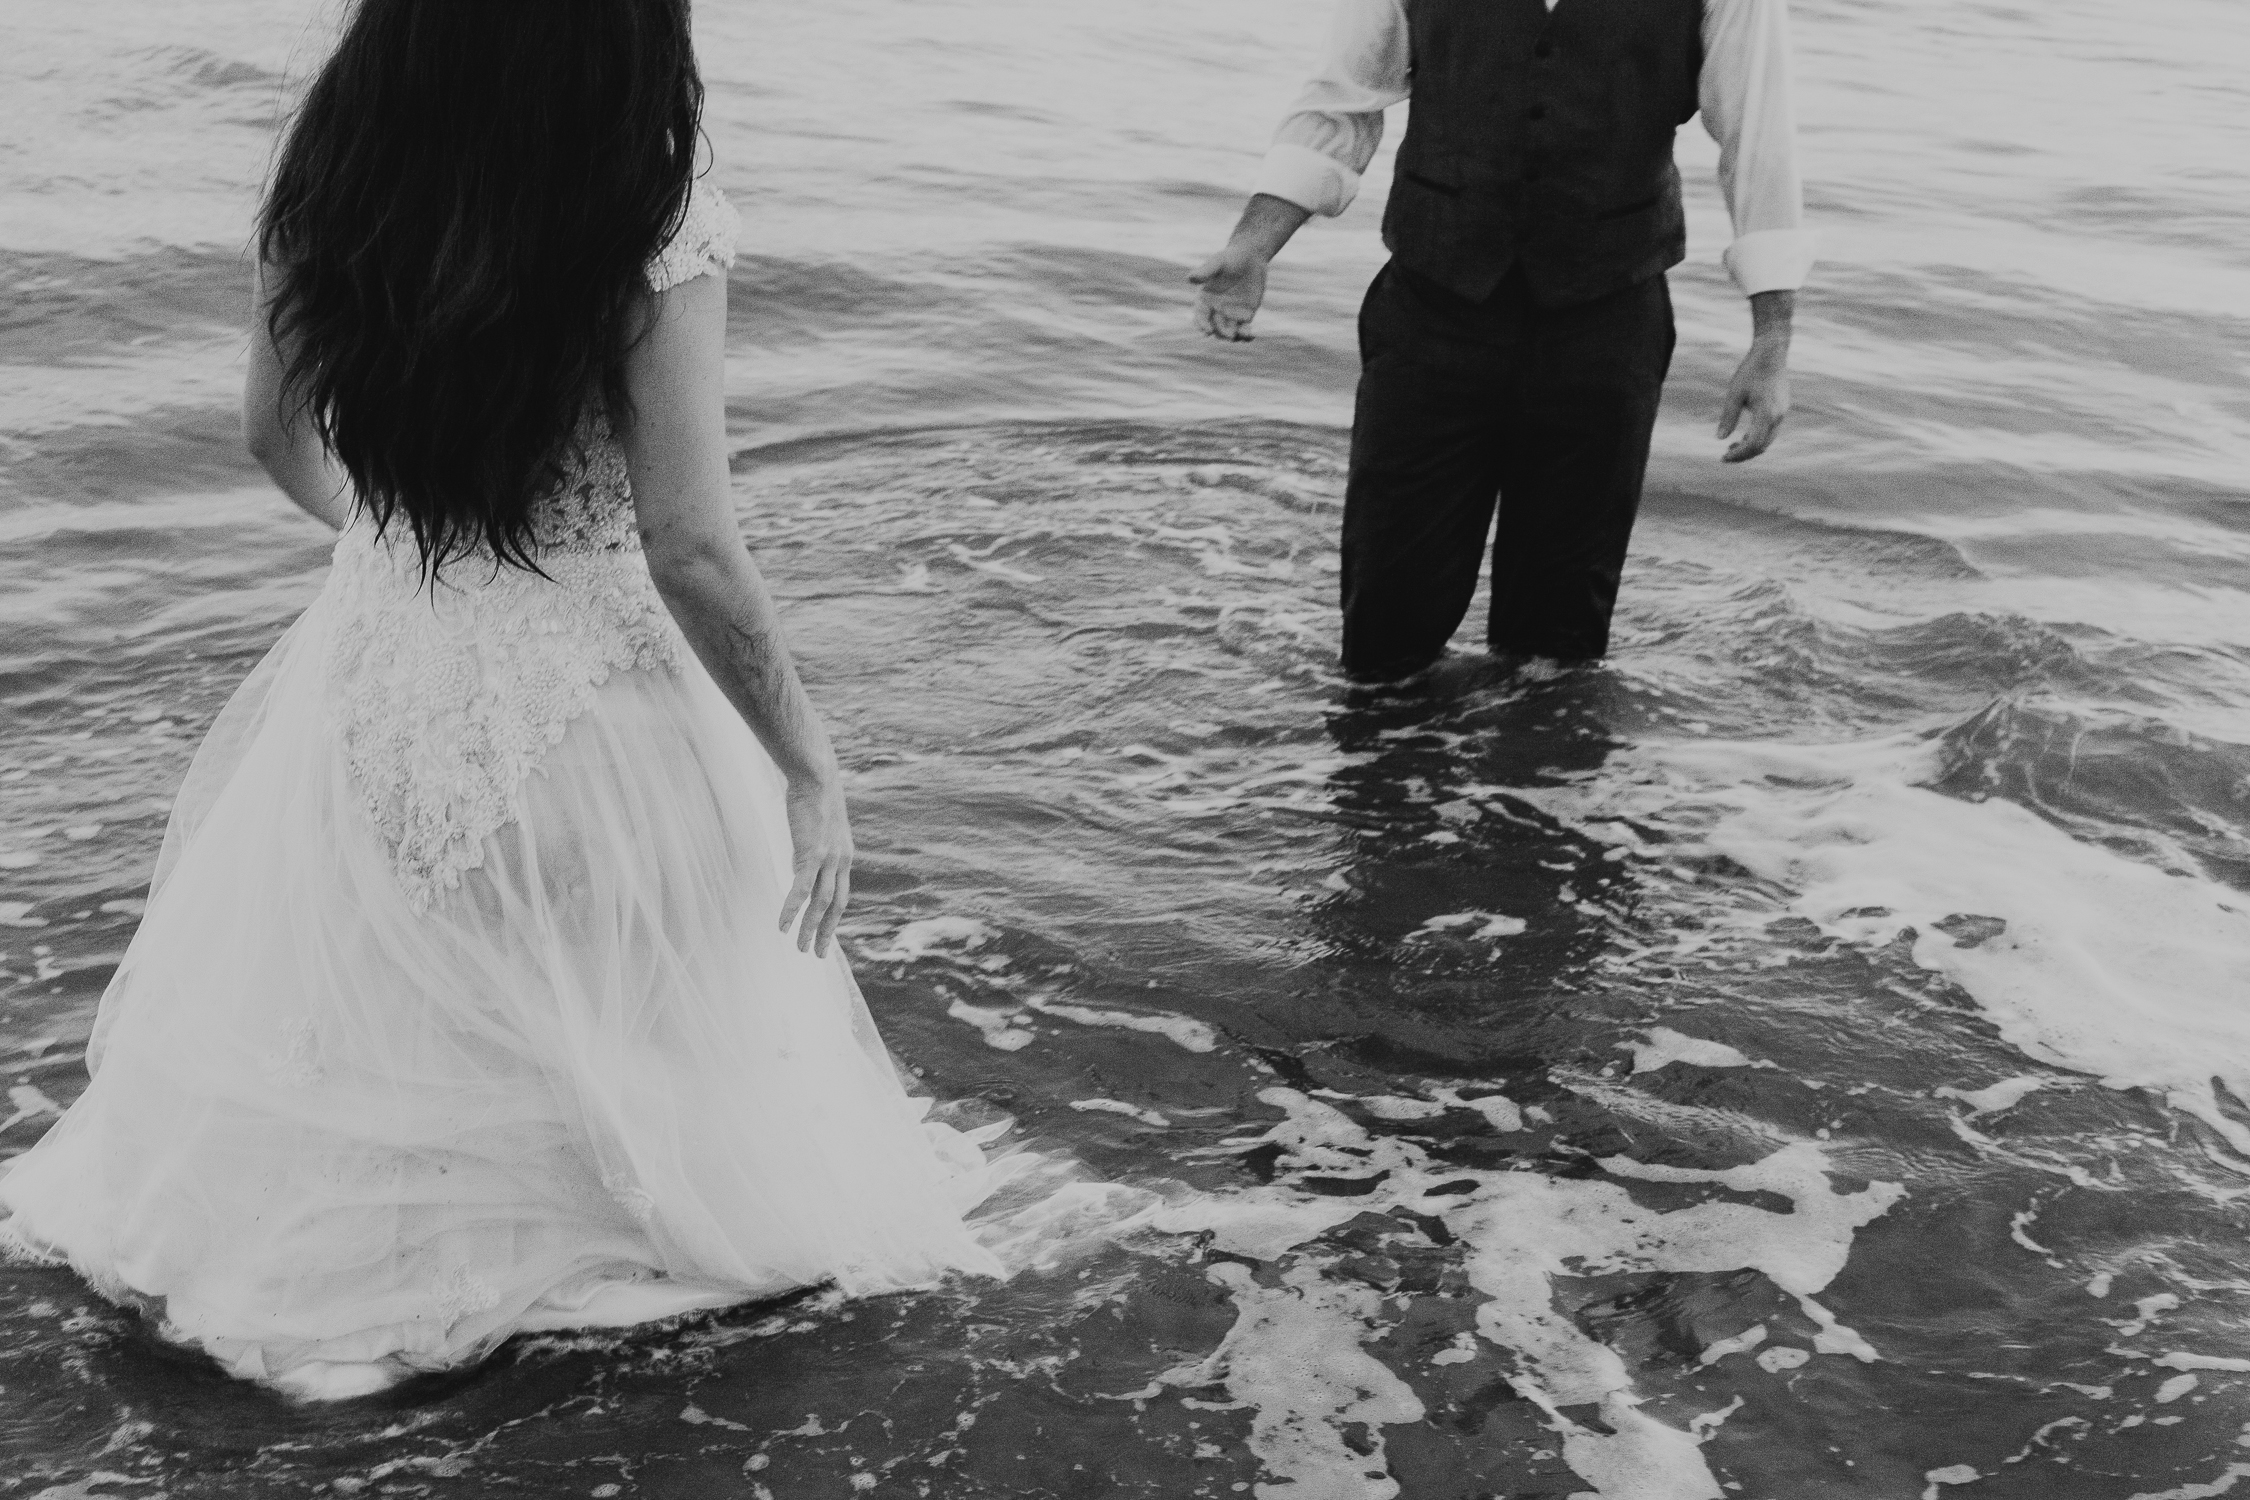 Michelle-Agurto-Fotografia-Bodas-Ecuador-Destination-Wedding-Photographer-Gabriela-Gabriel-28.JPG